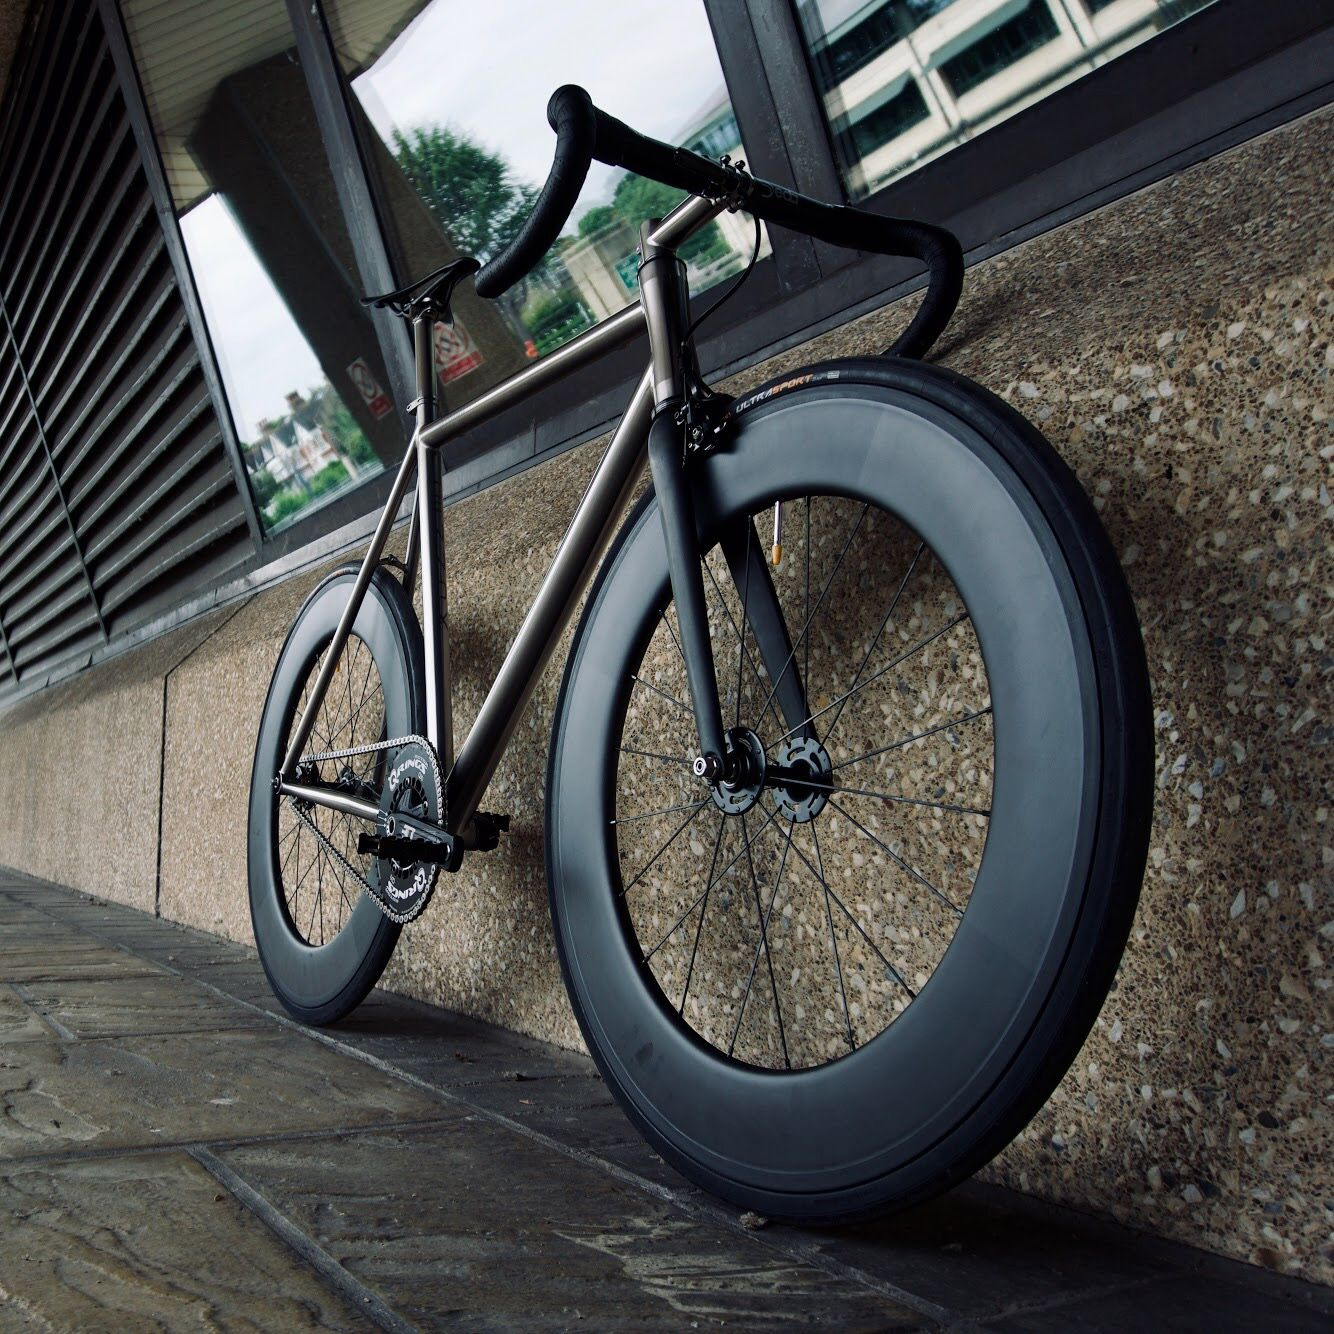 Road MTB bicycle saddle Cycling Fixed Urban Racing Bike Seat Long Rail Comfort